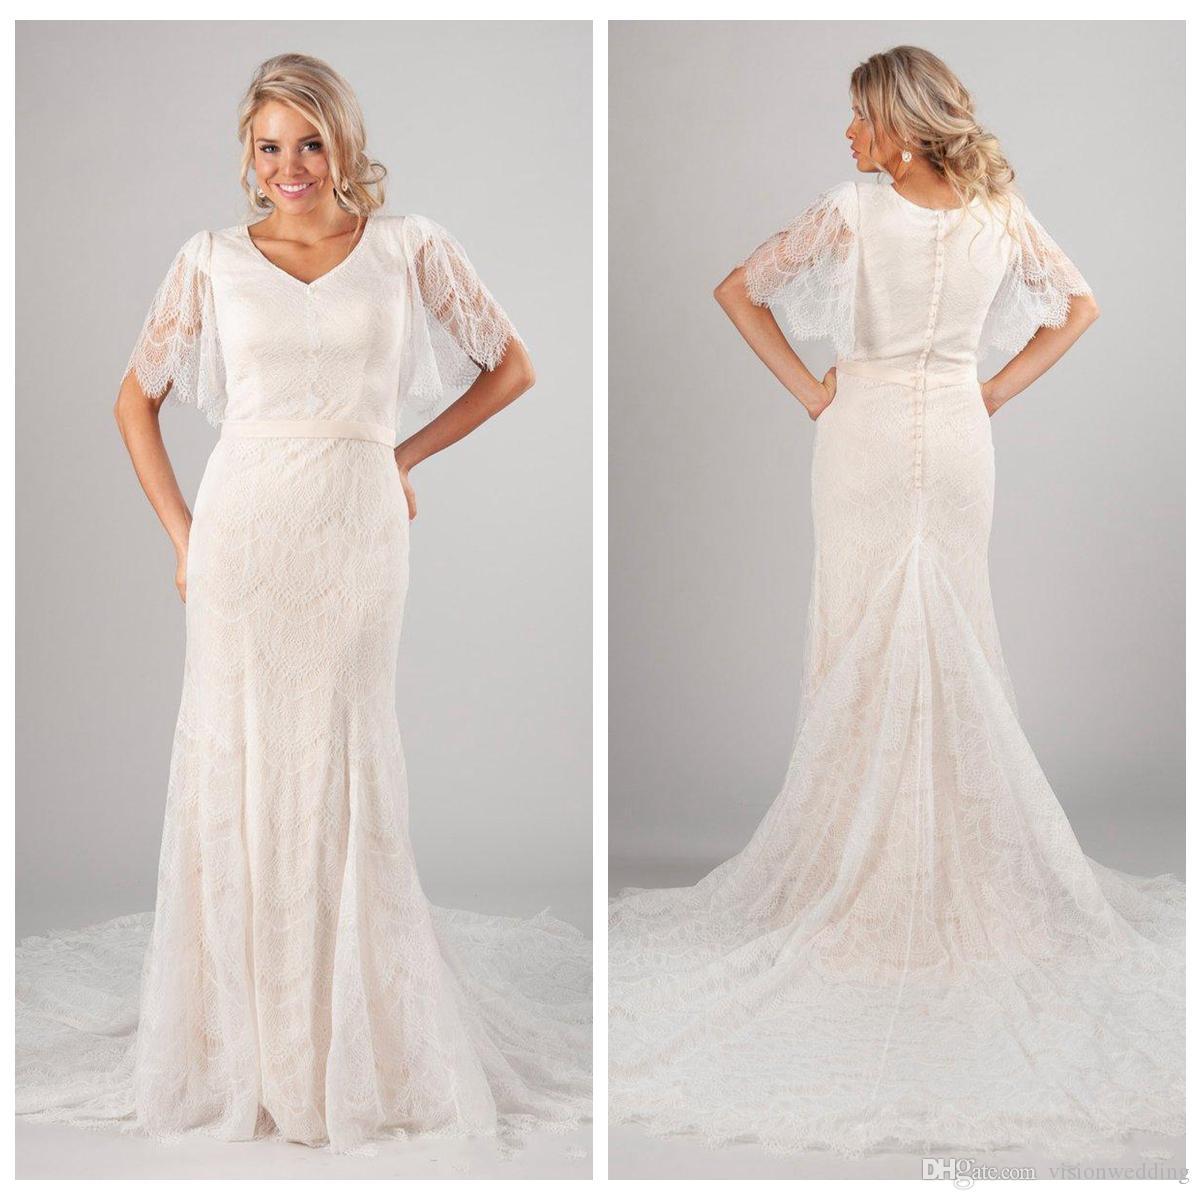 V-Neck Short Sleeve Backless Wedding Dress